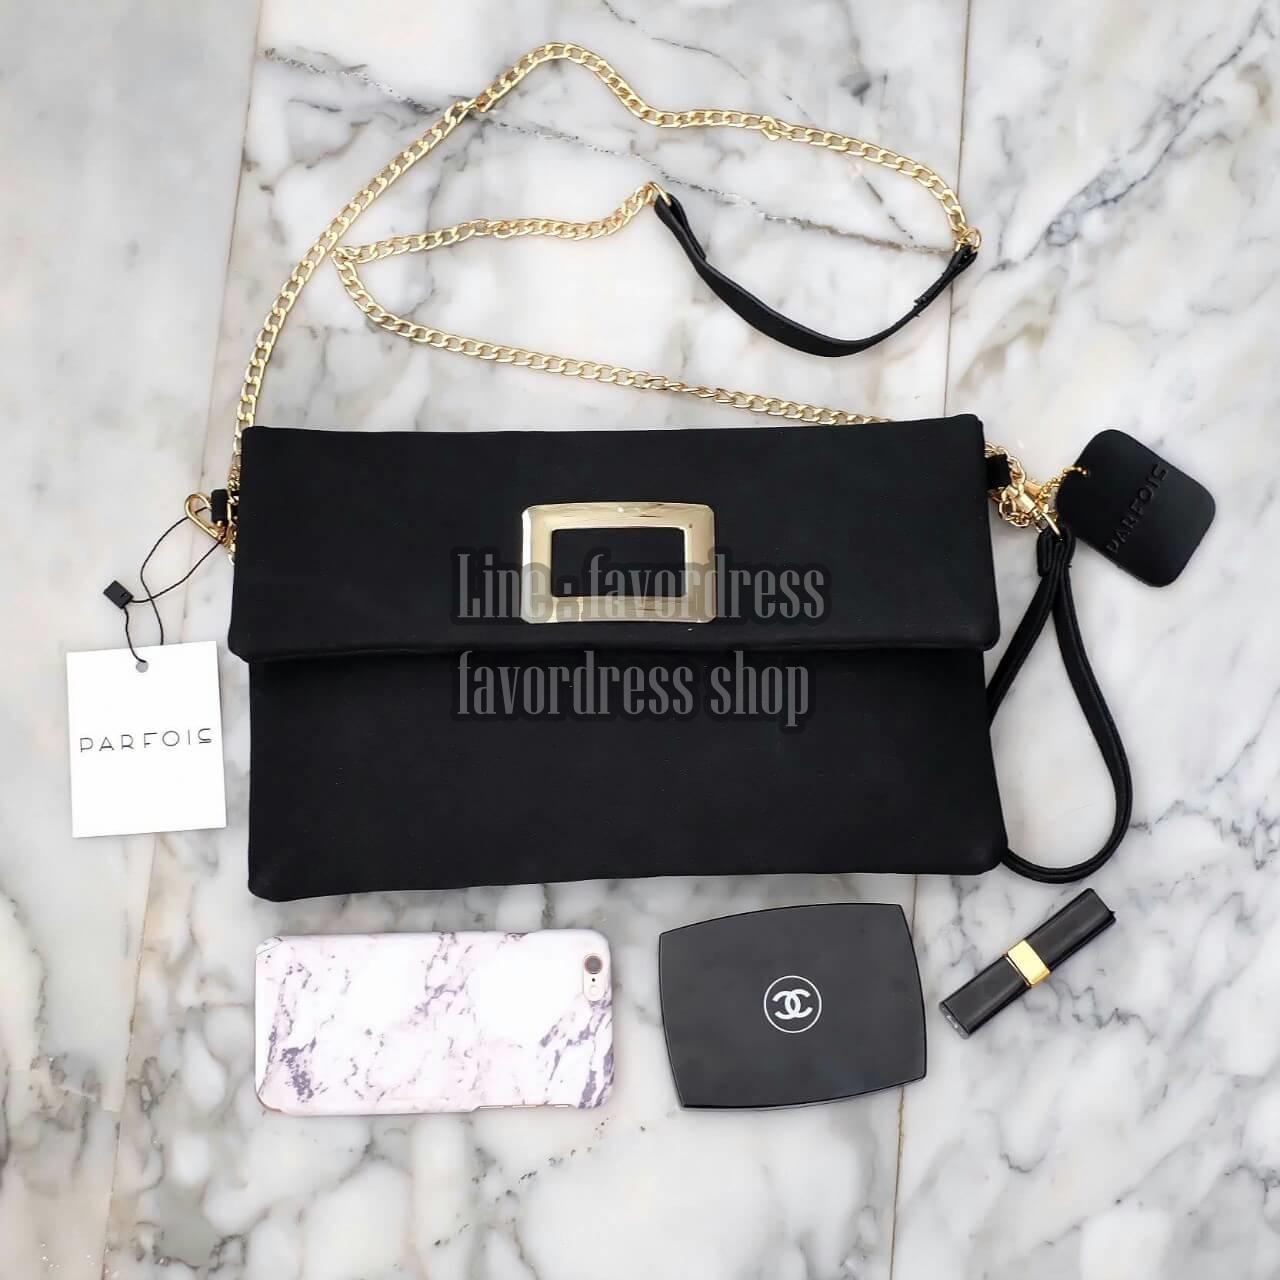 PARFOIS Clutch bag with strap รุ่นหายาก